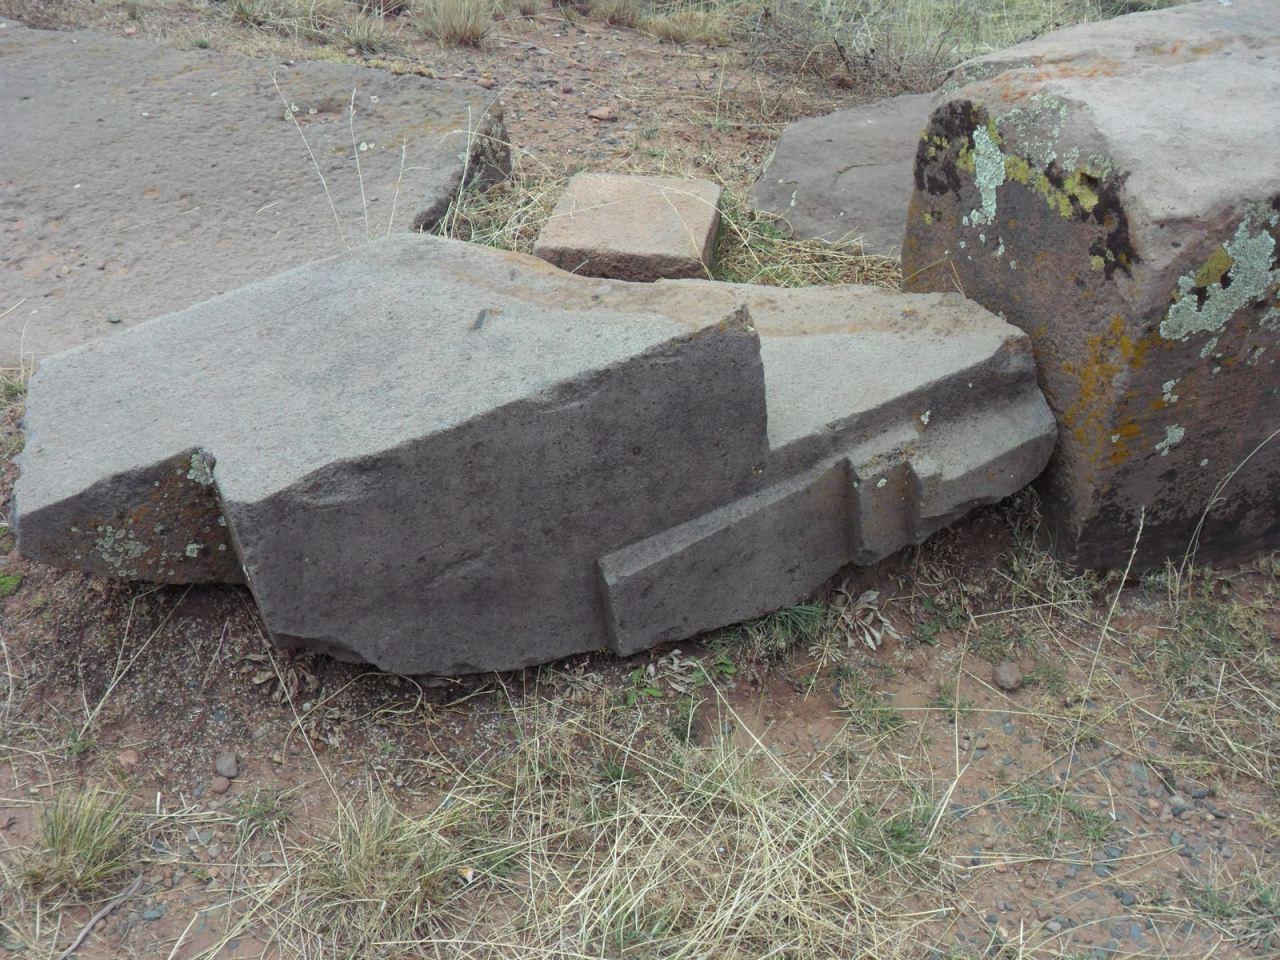 Sito-Megalitico-Piramide-Akapana-Kalasasaya-Menhir-Tiahuanaco-Bolivia-130